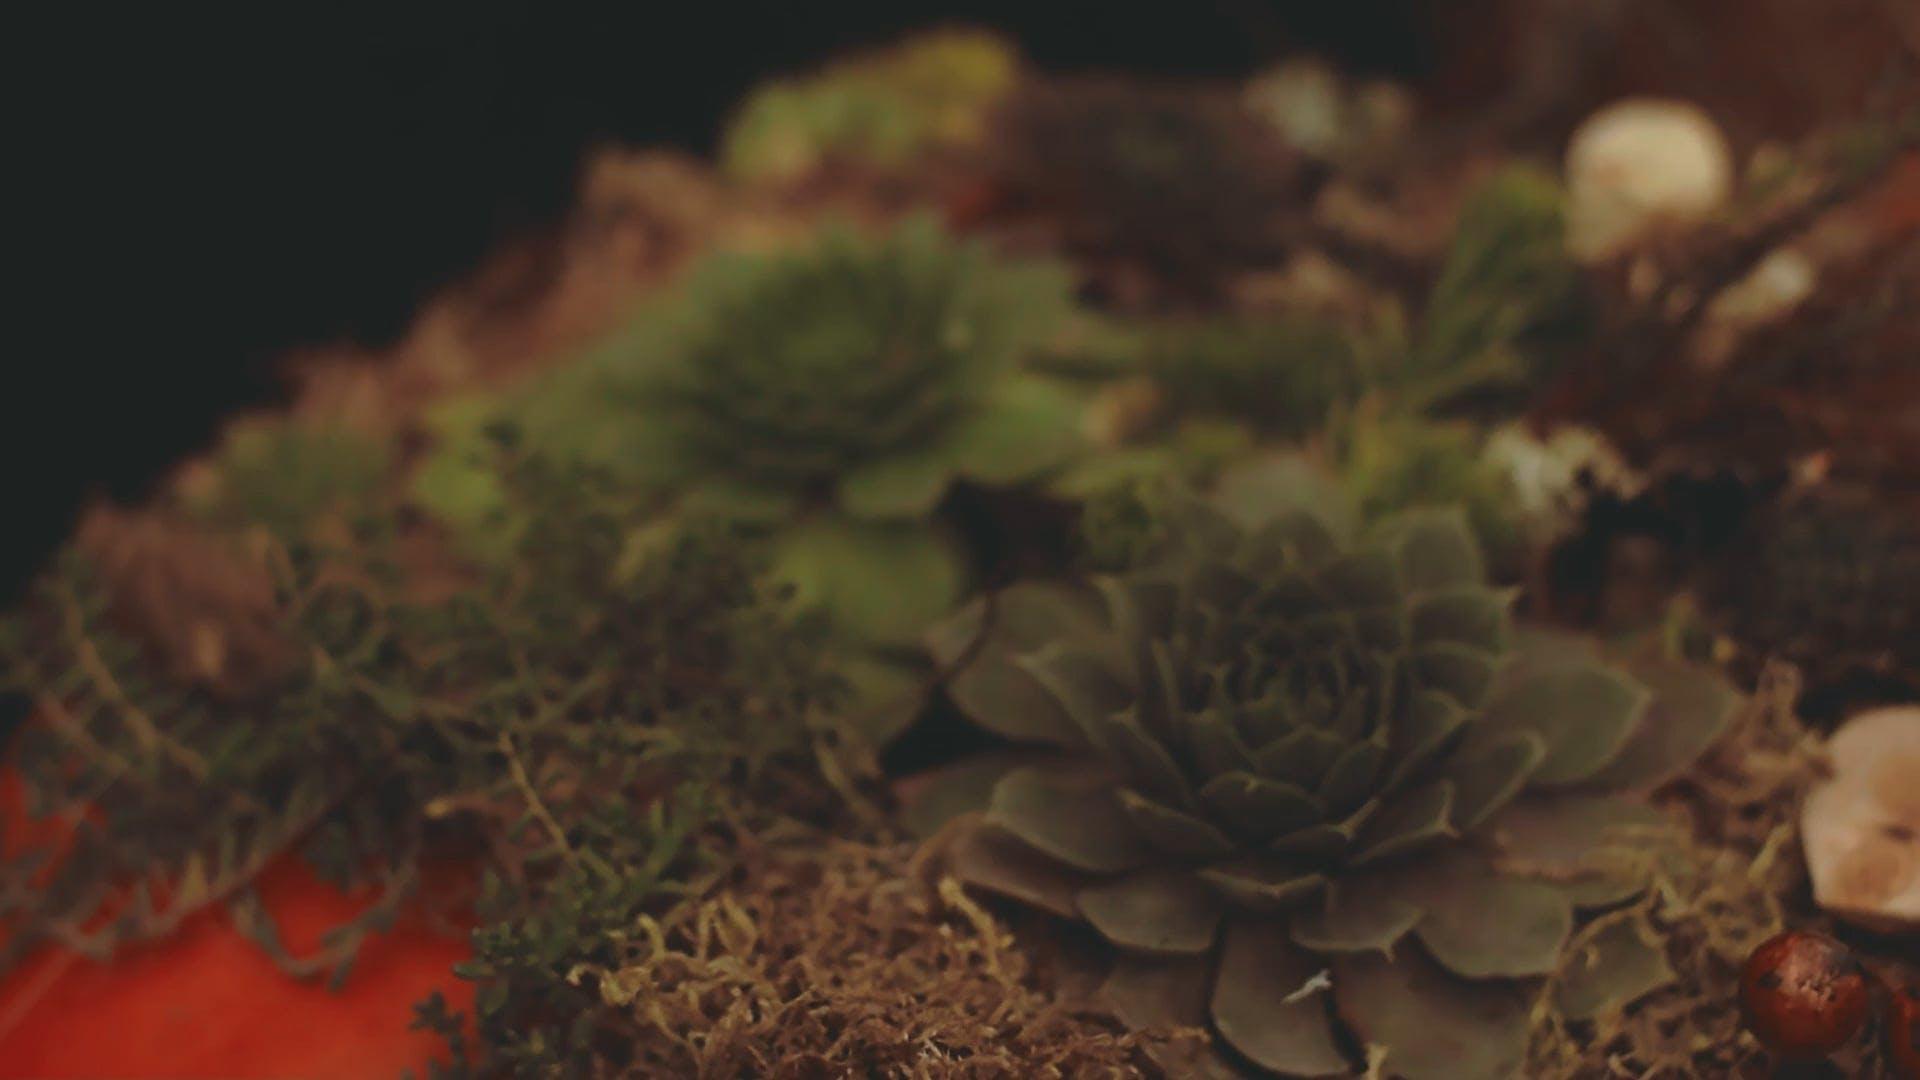 Echeveria - Succulent Plant